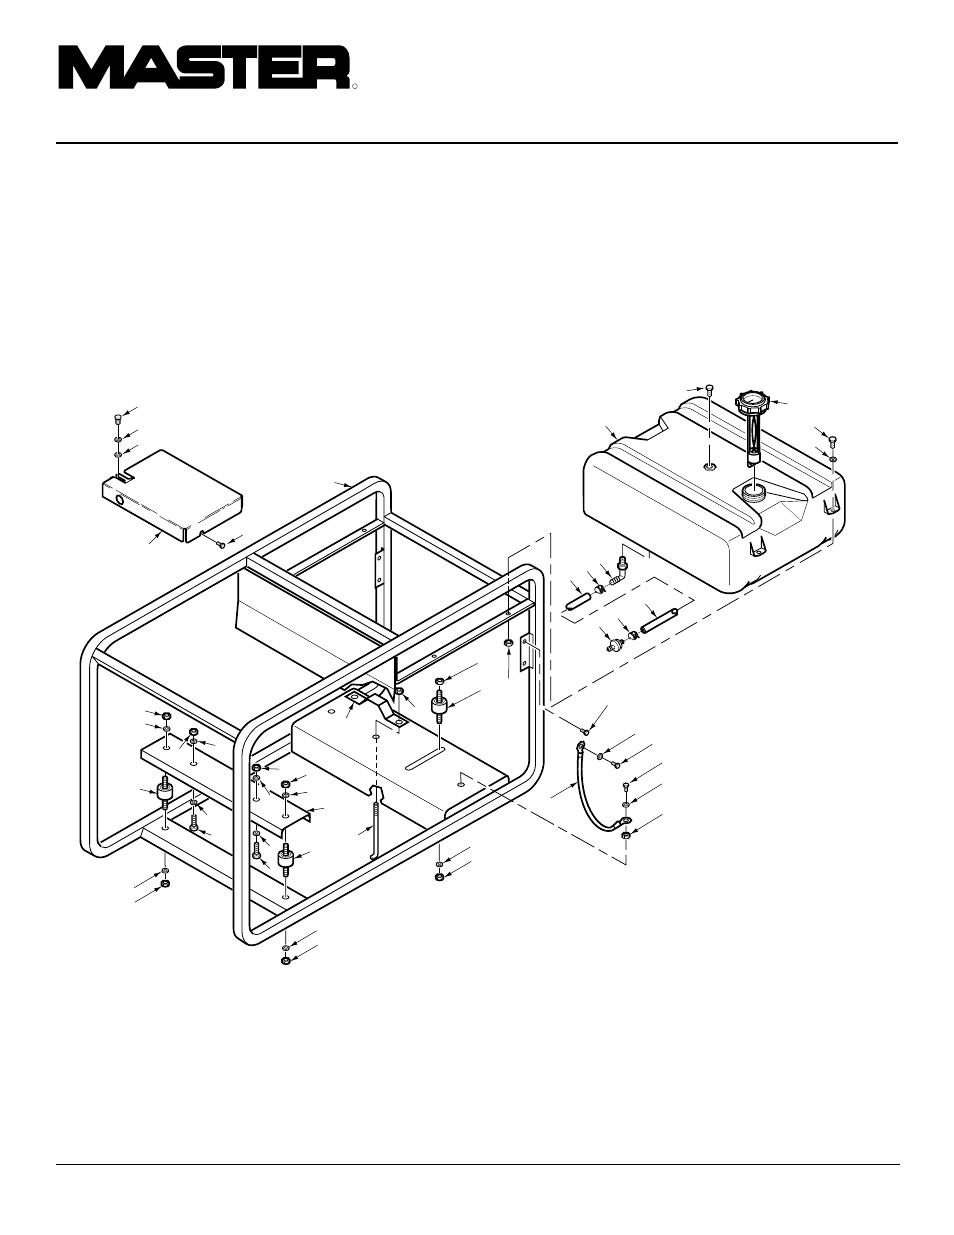 Portable gasoline generators, Illustrated parts list